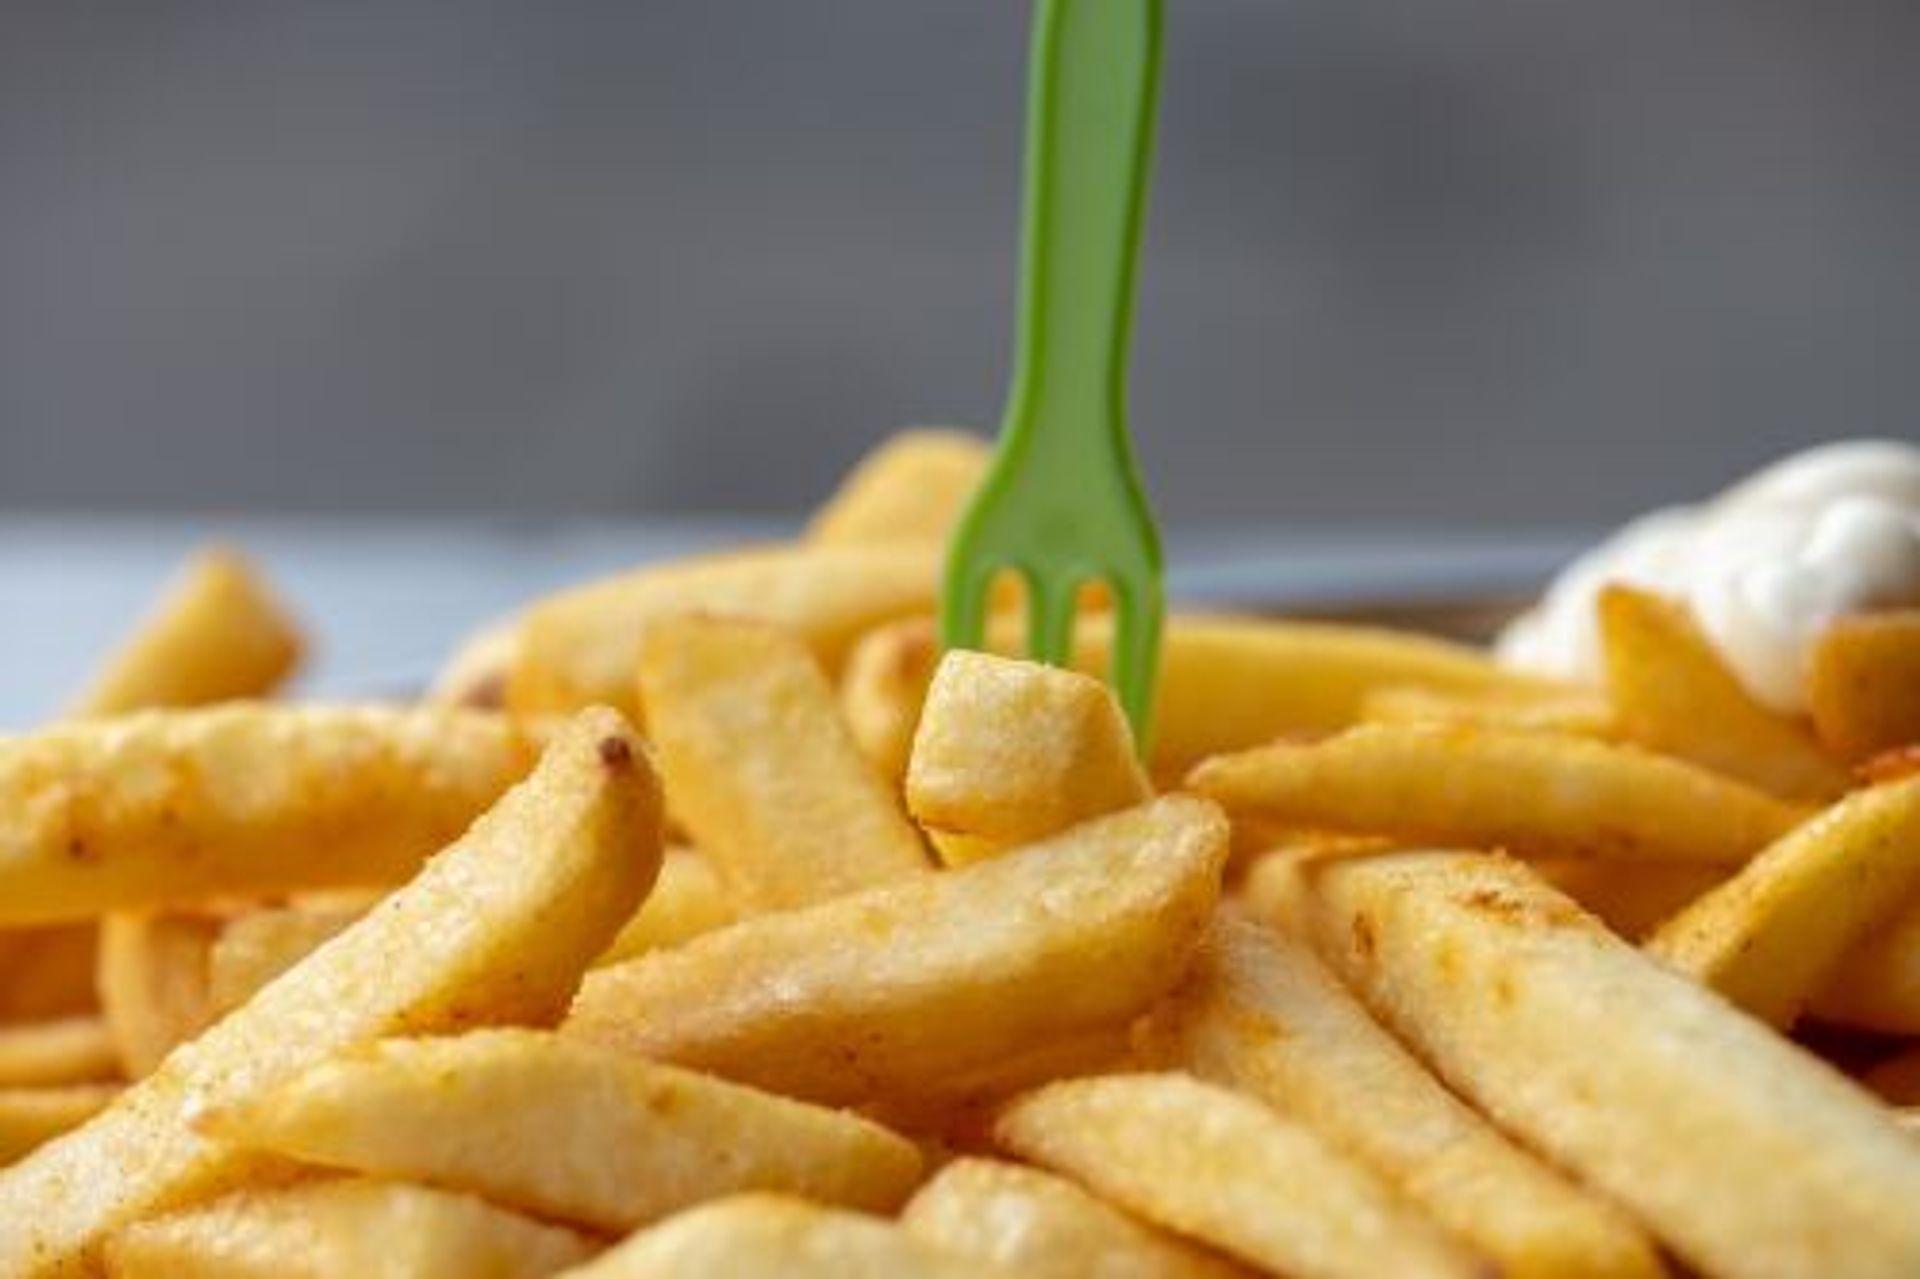 1 april loket: Gaat Remia van fritessaus naar patatsaus?